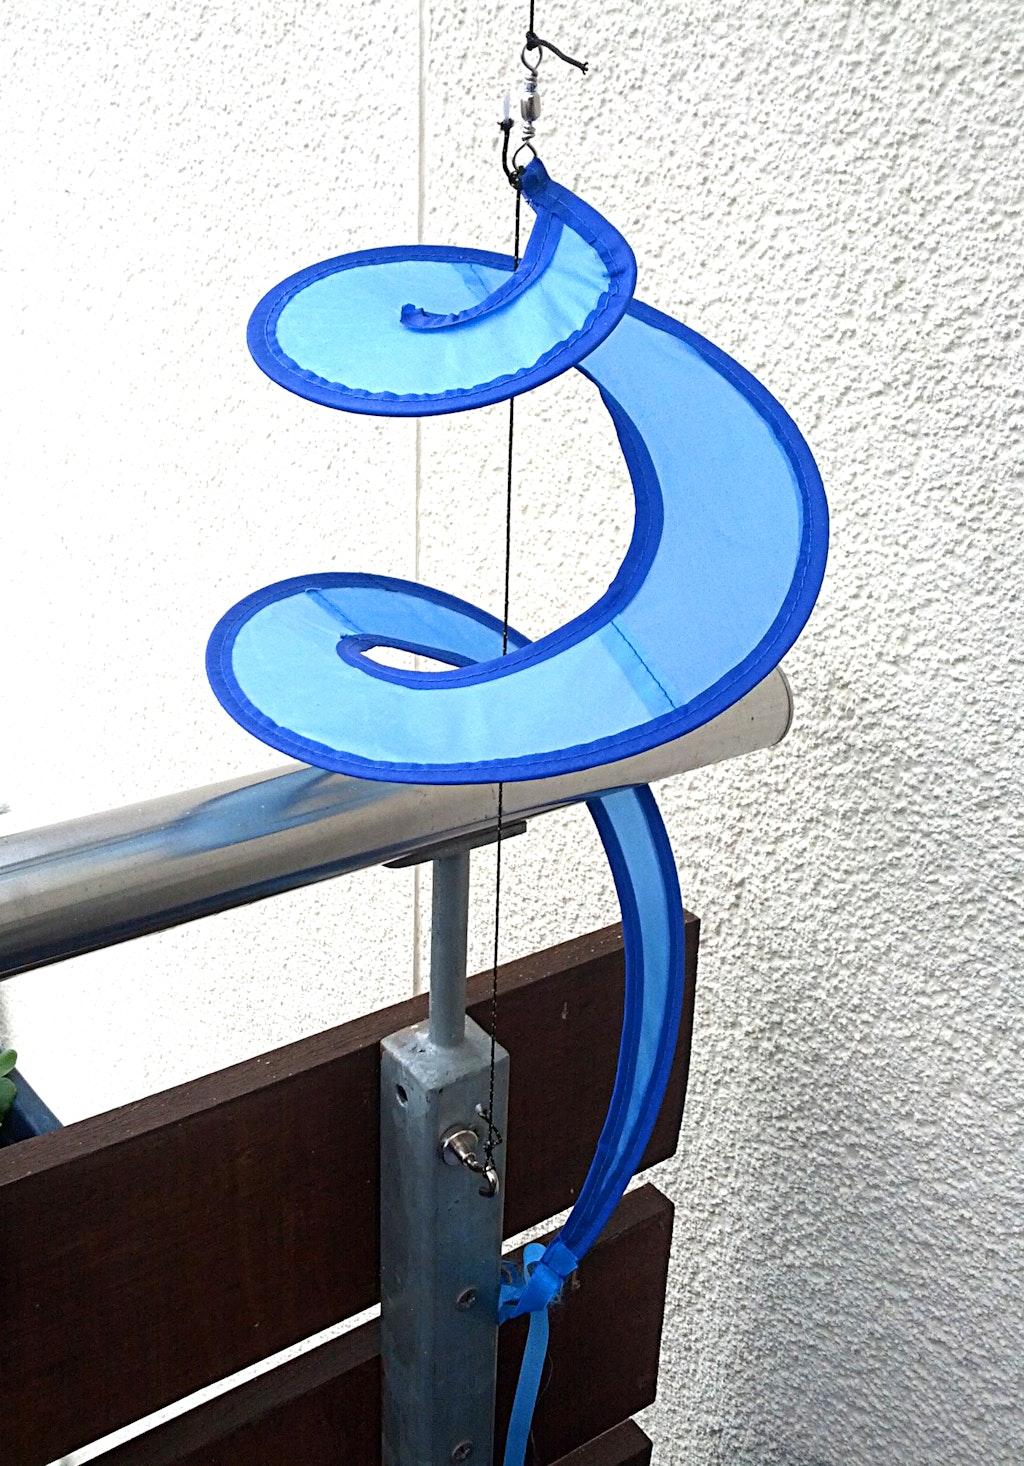 lampion magnetisch an aluminium aufh ngen supermagnete. Black Bedroom Furniture Sets. Home Design Ideas